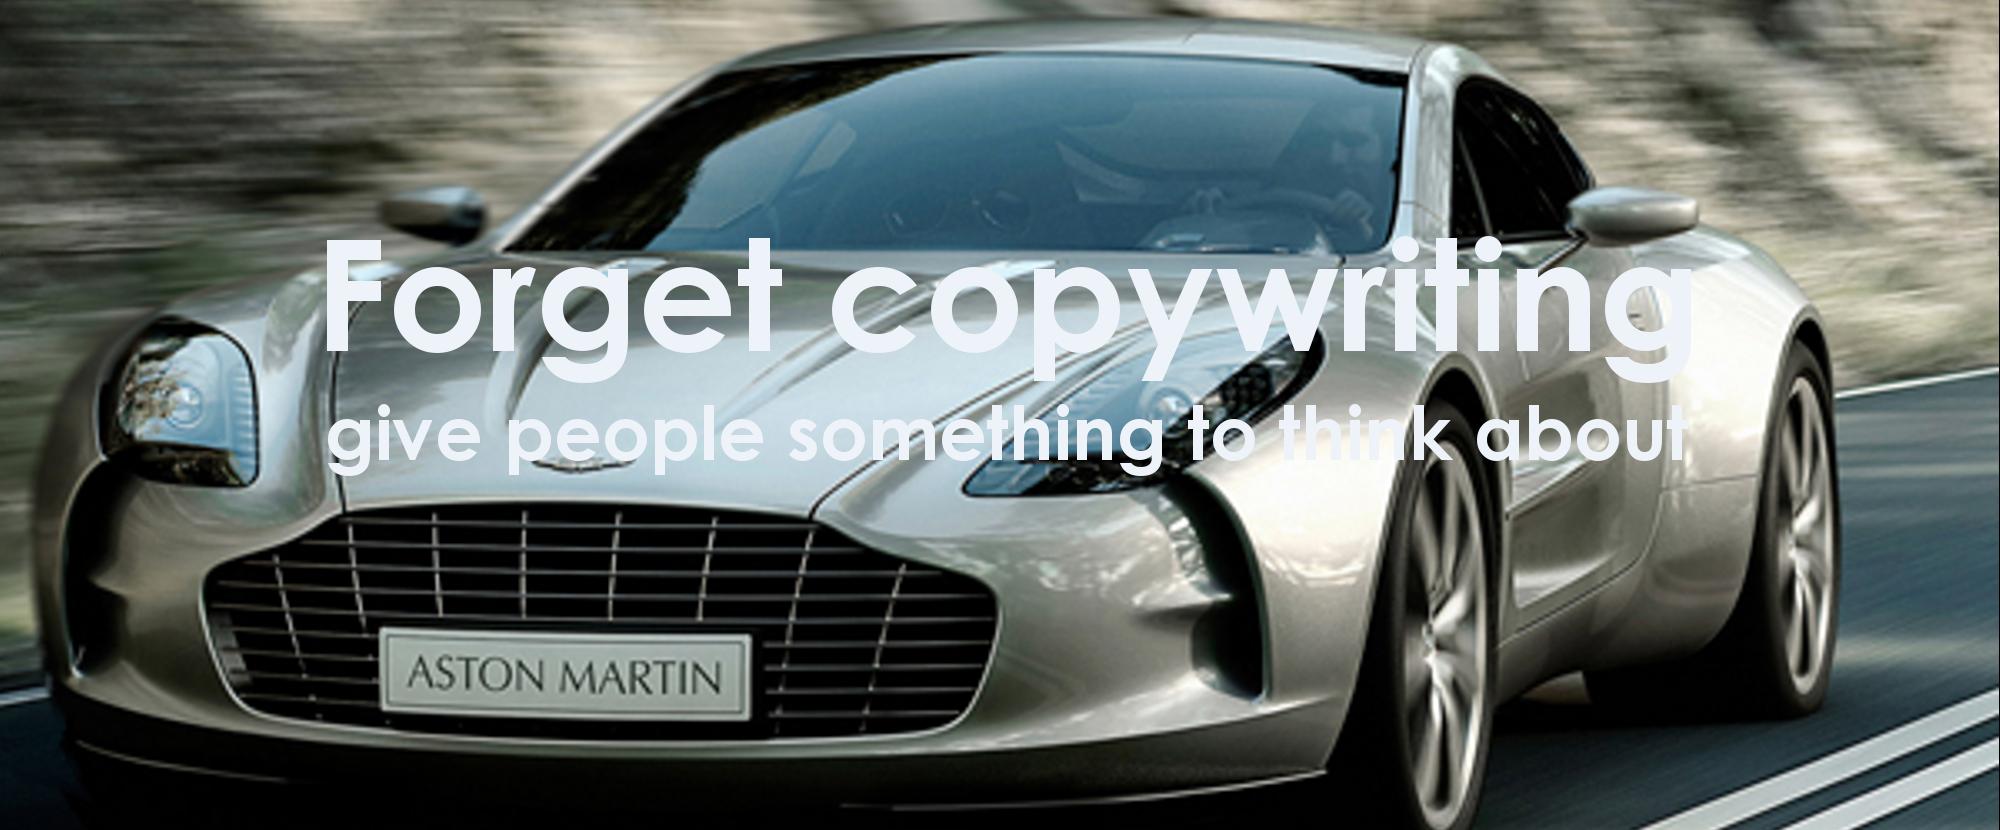 Copywriting as a thrill